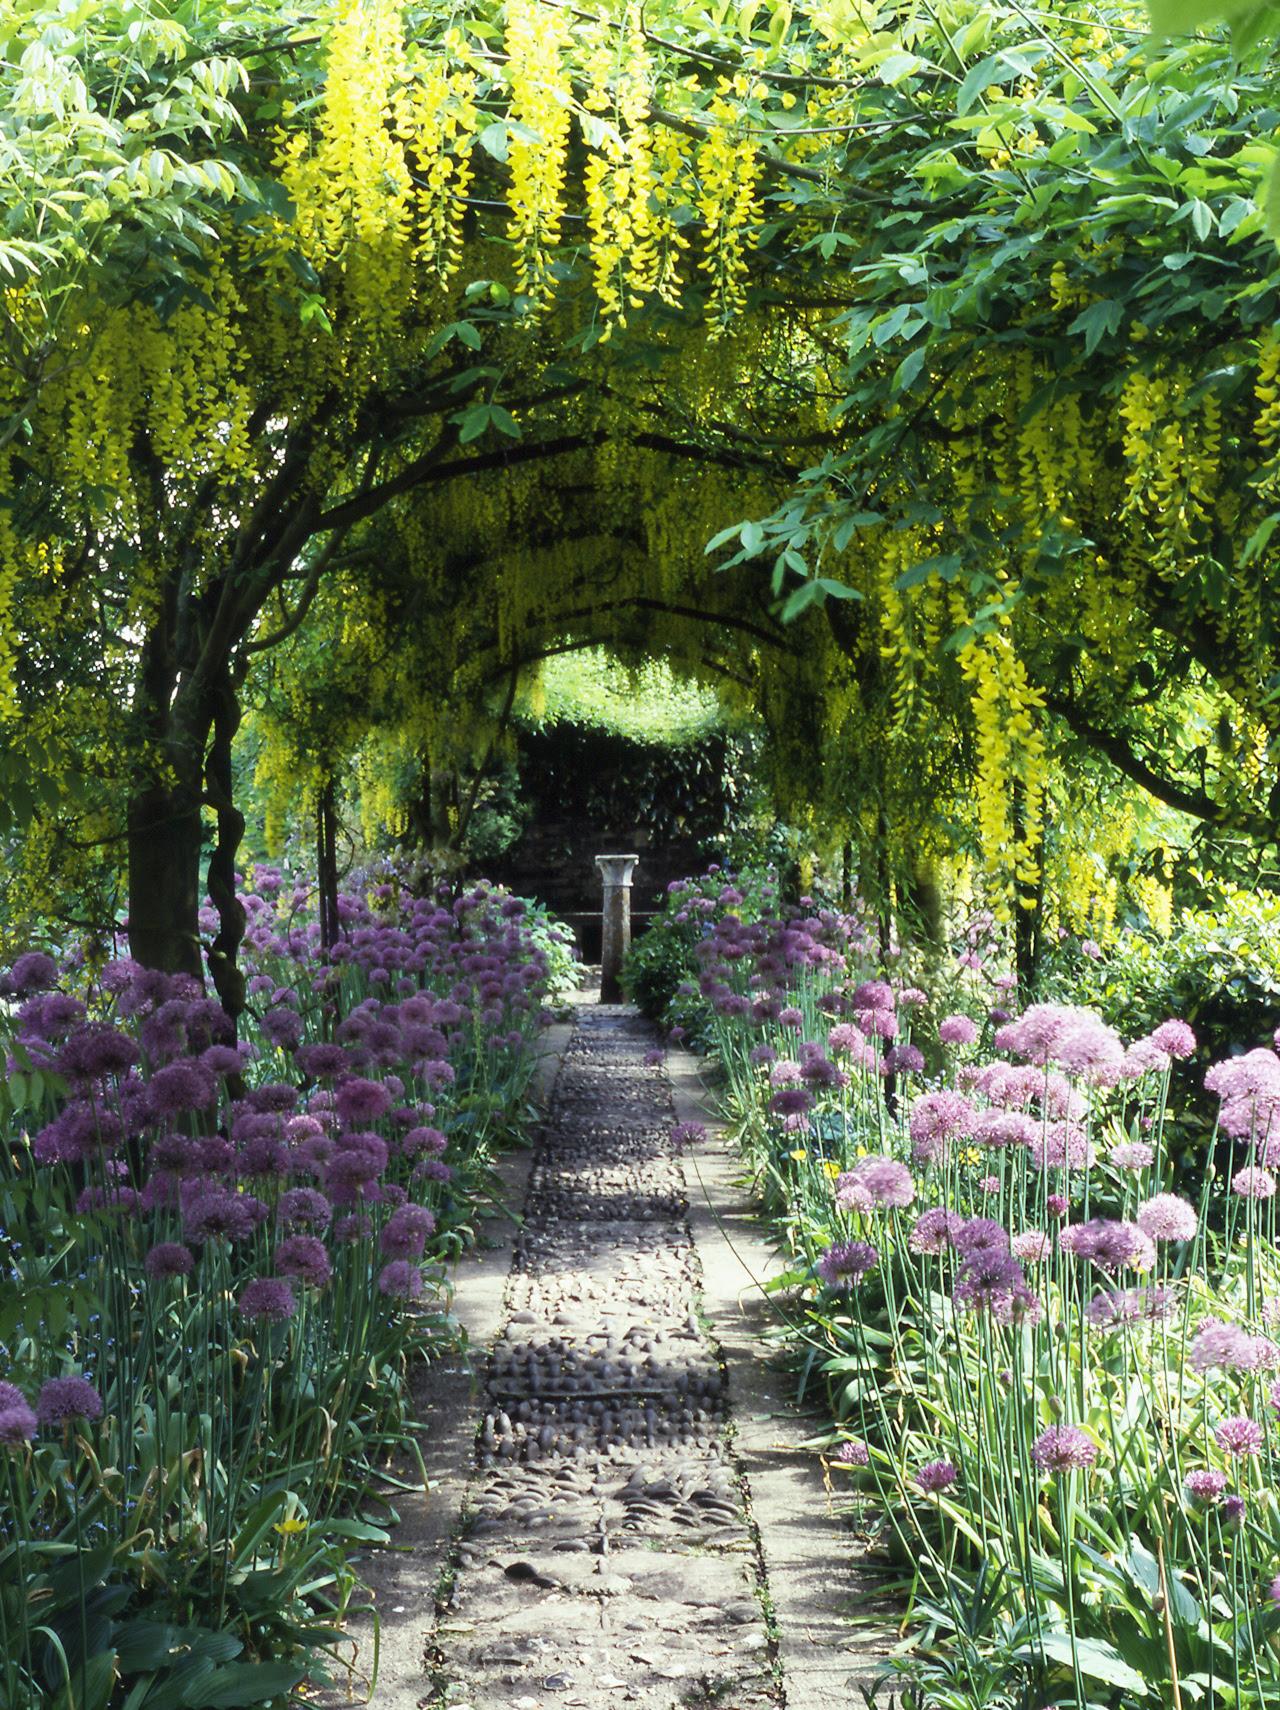 barnsley_house_garden_315_jpg_original